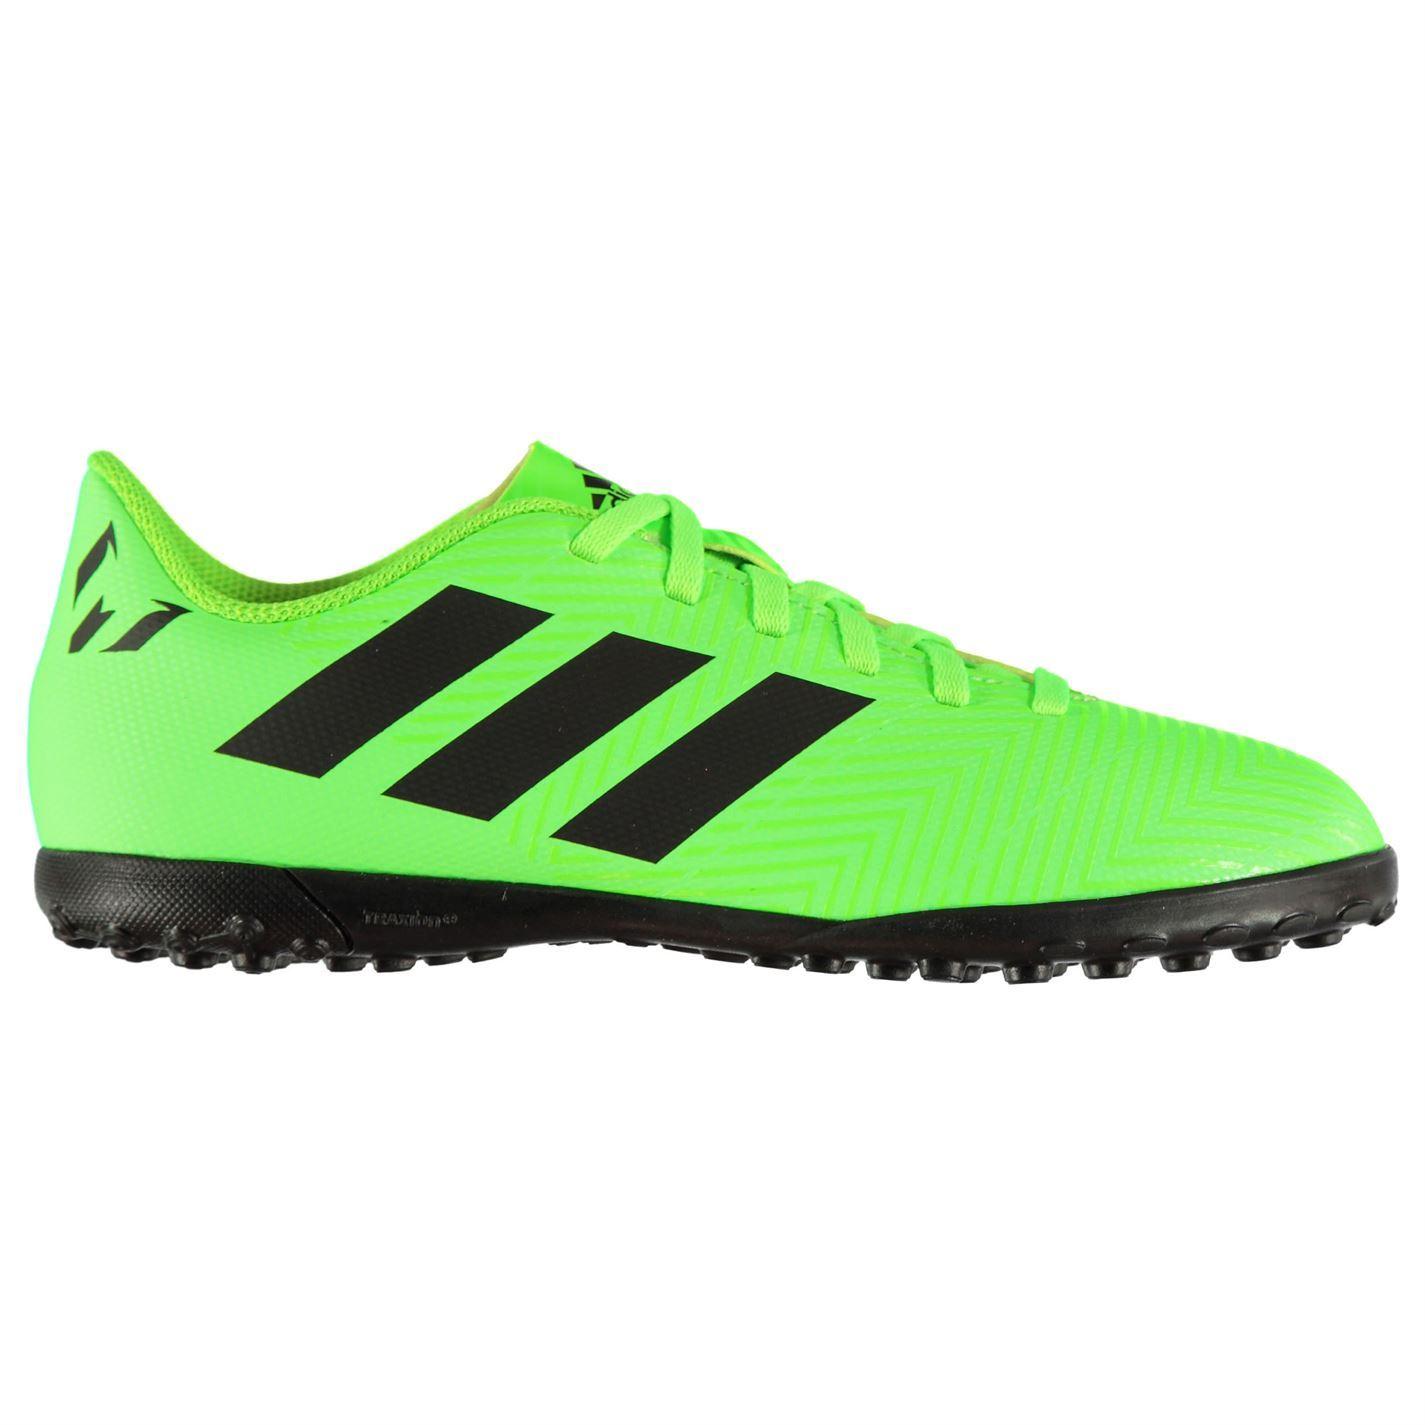 d7aee5e8f adidas Kids Nemeziz Messi 18.4 Junior Astro Turf Trainers Football Boots  Lace Up